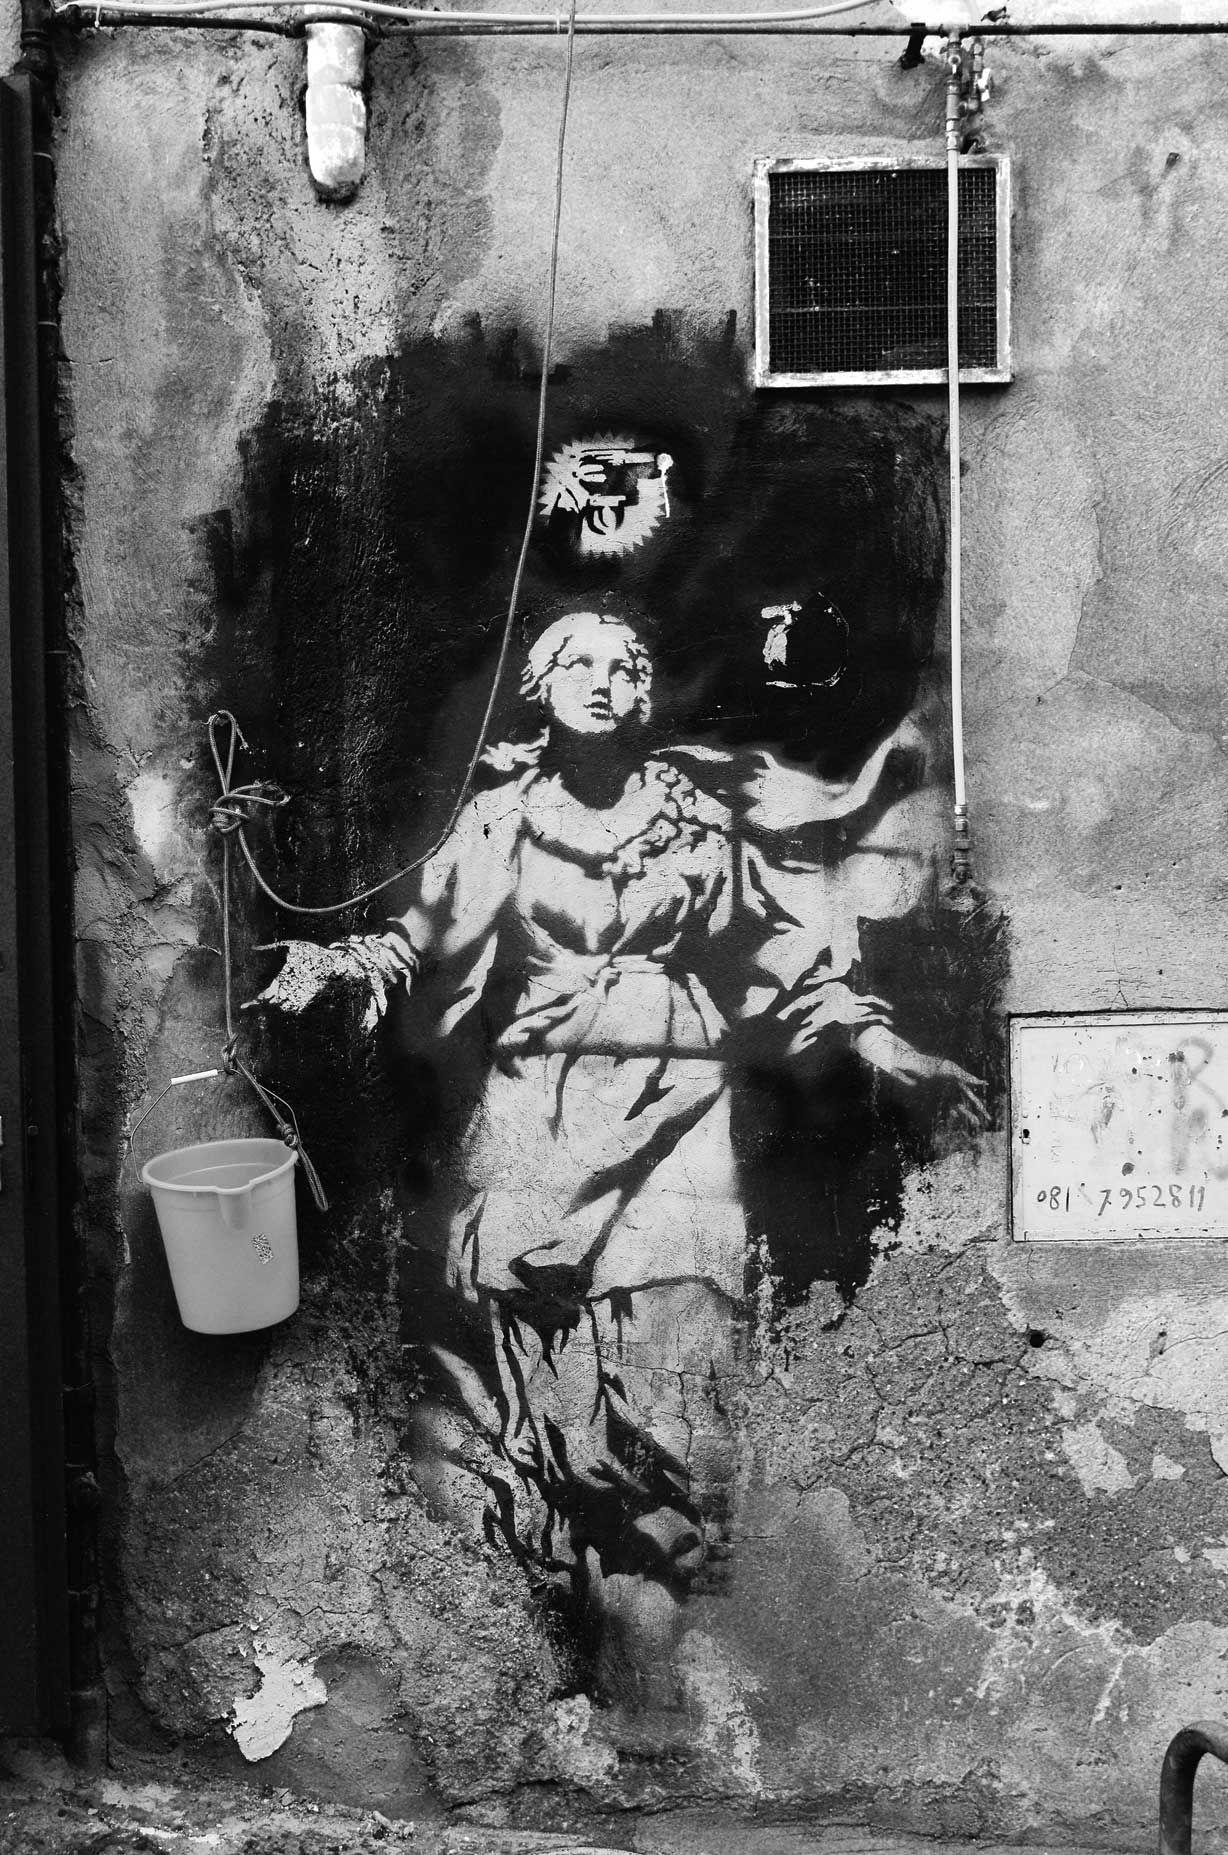 Banksy, Napoli 2009 Street Art in Naples, Italy-Banksj-Madonna con la pistola